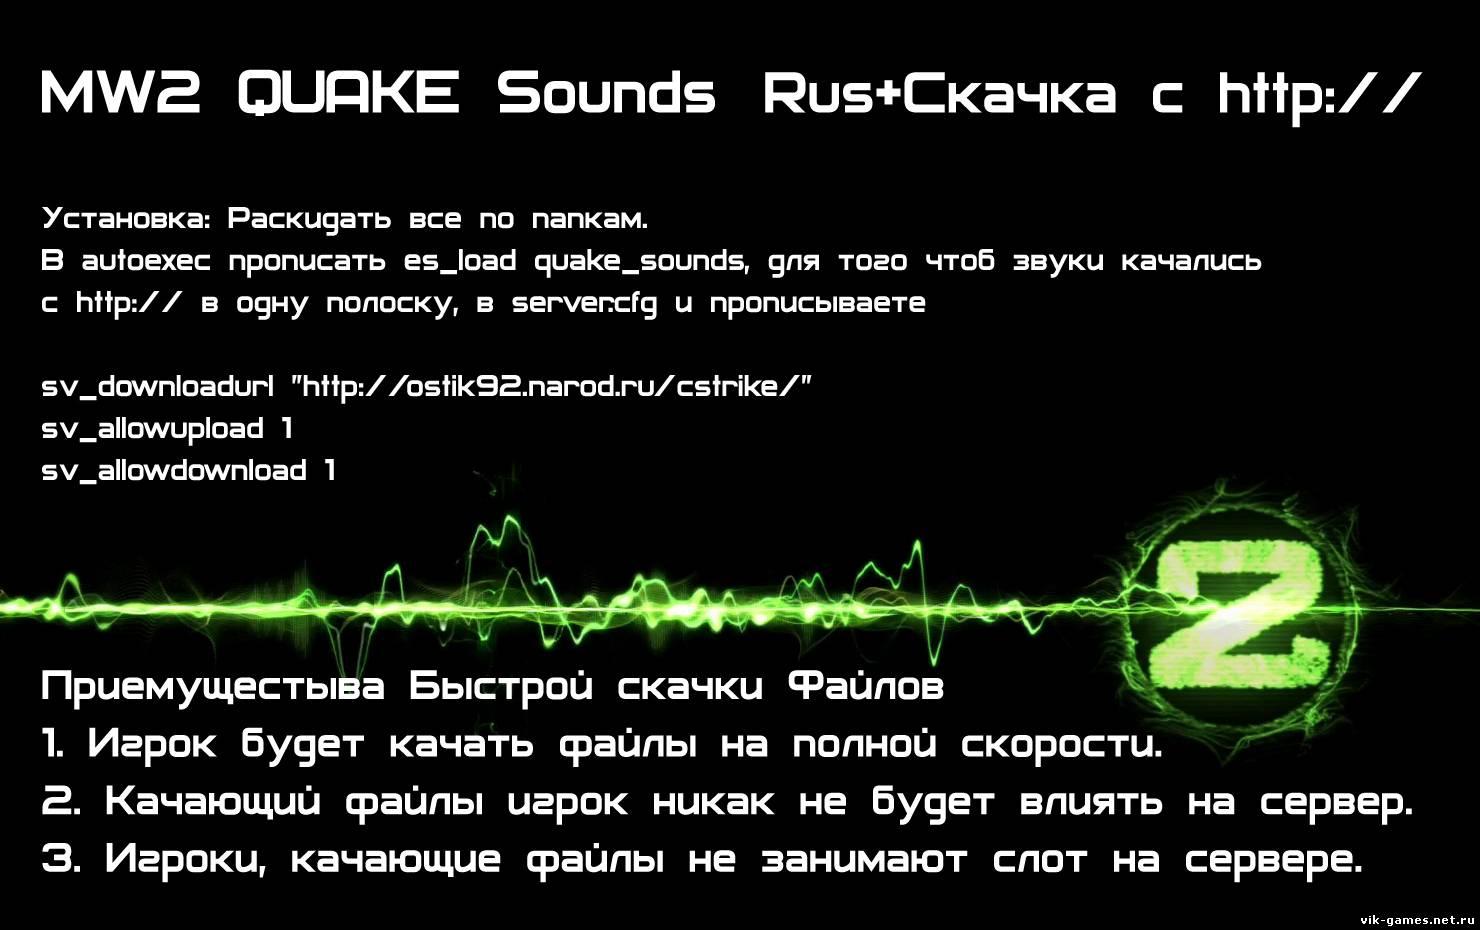 Quake sounds russian